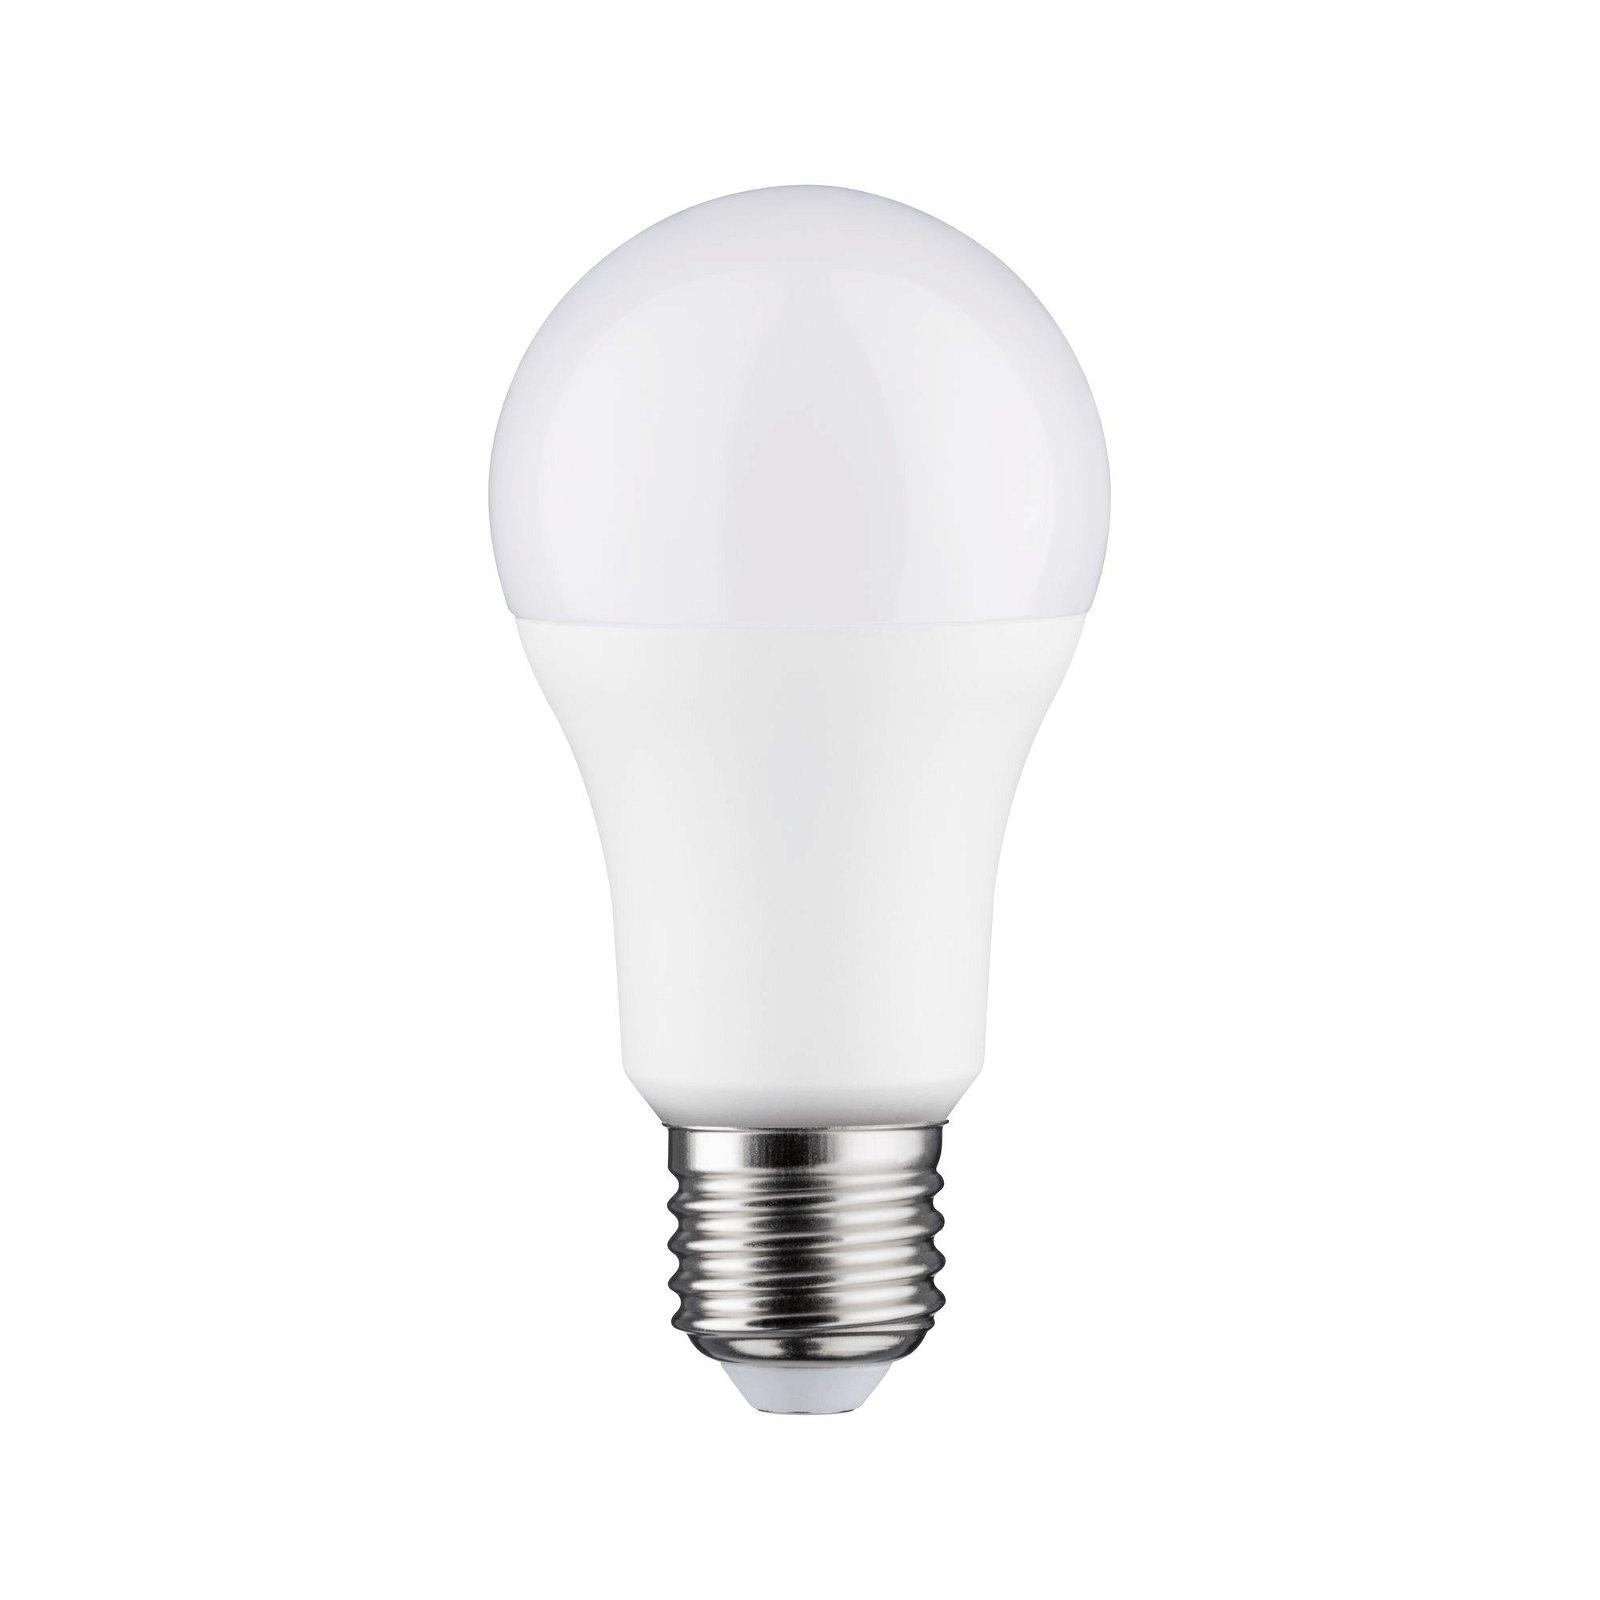 LED Birne Smart Home Zigbee E27 230V 806lm 9,3W RGBW Matt